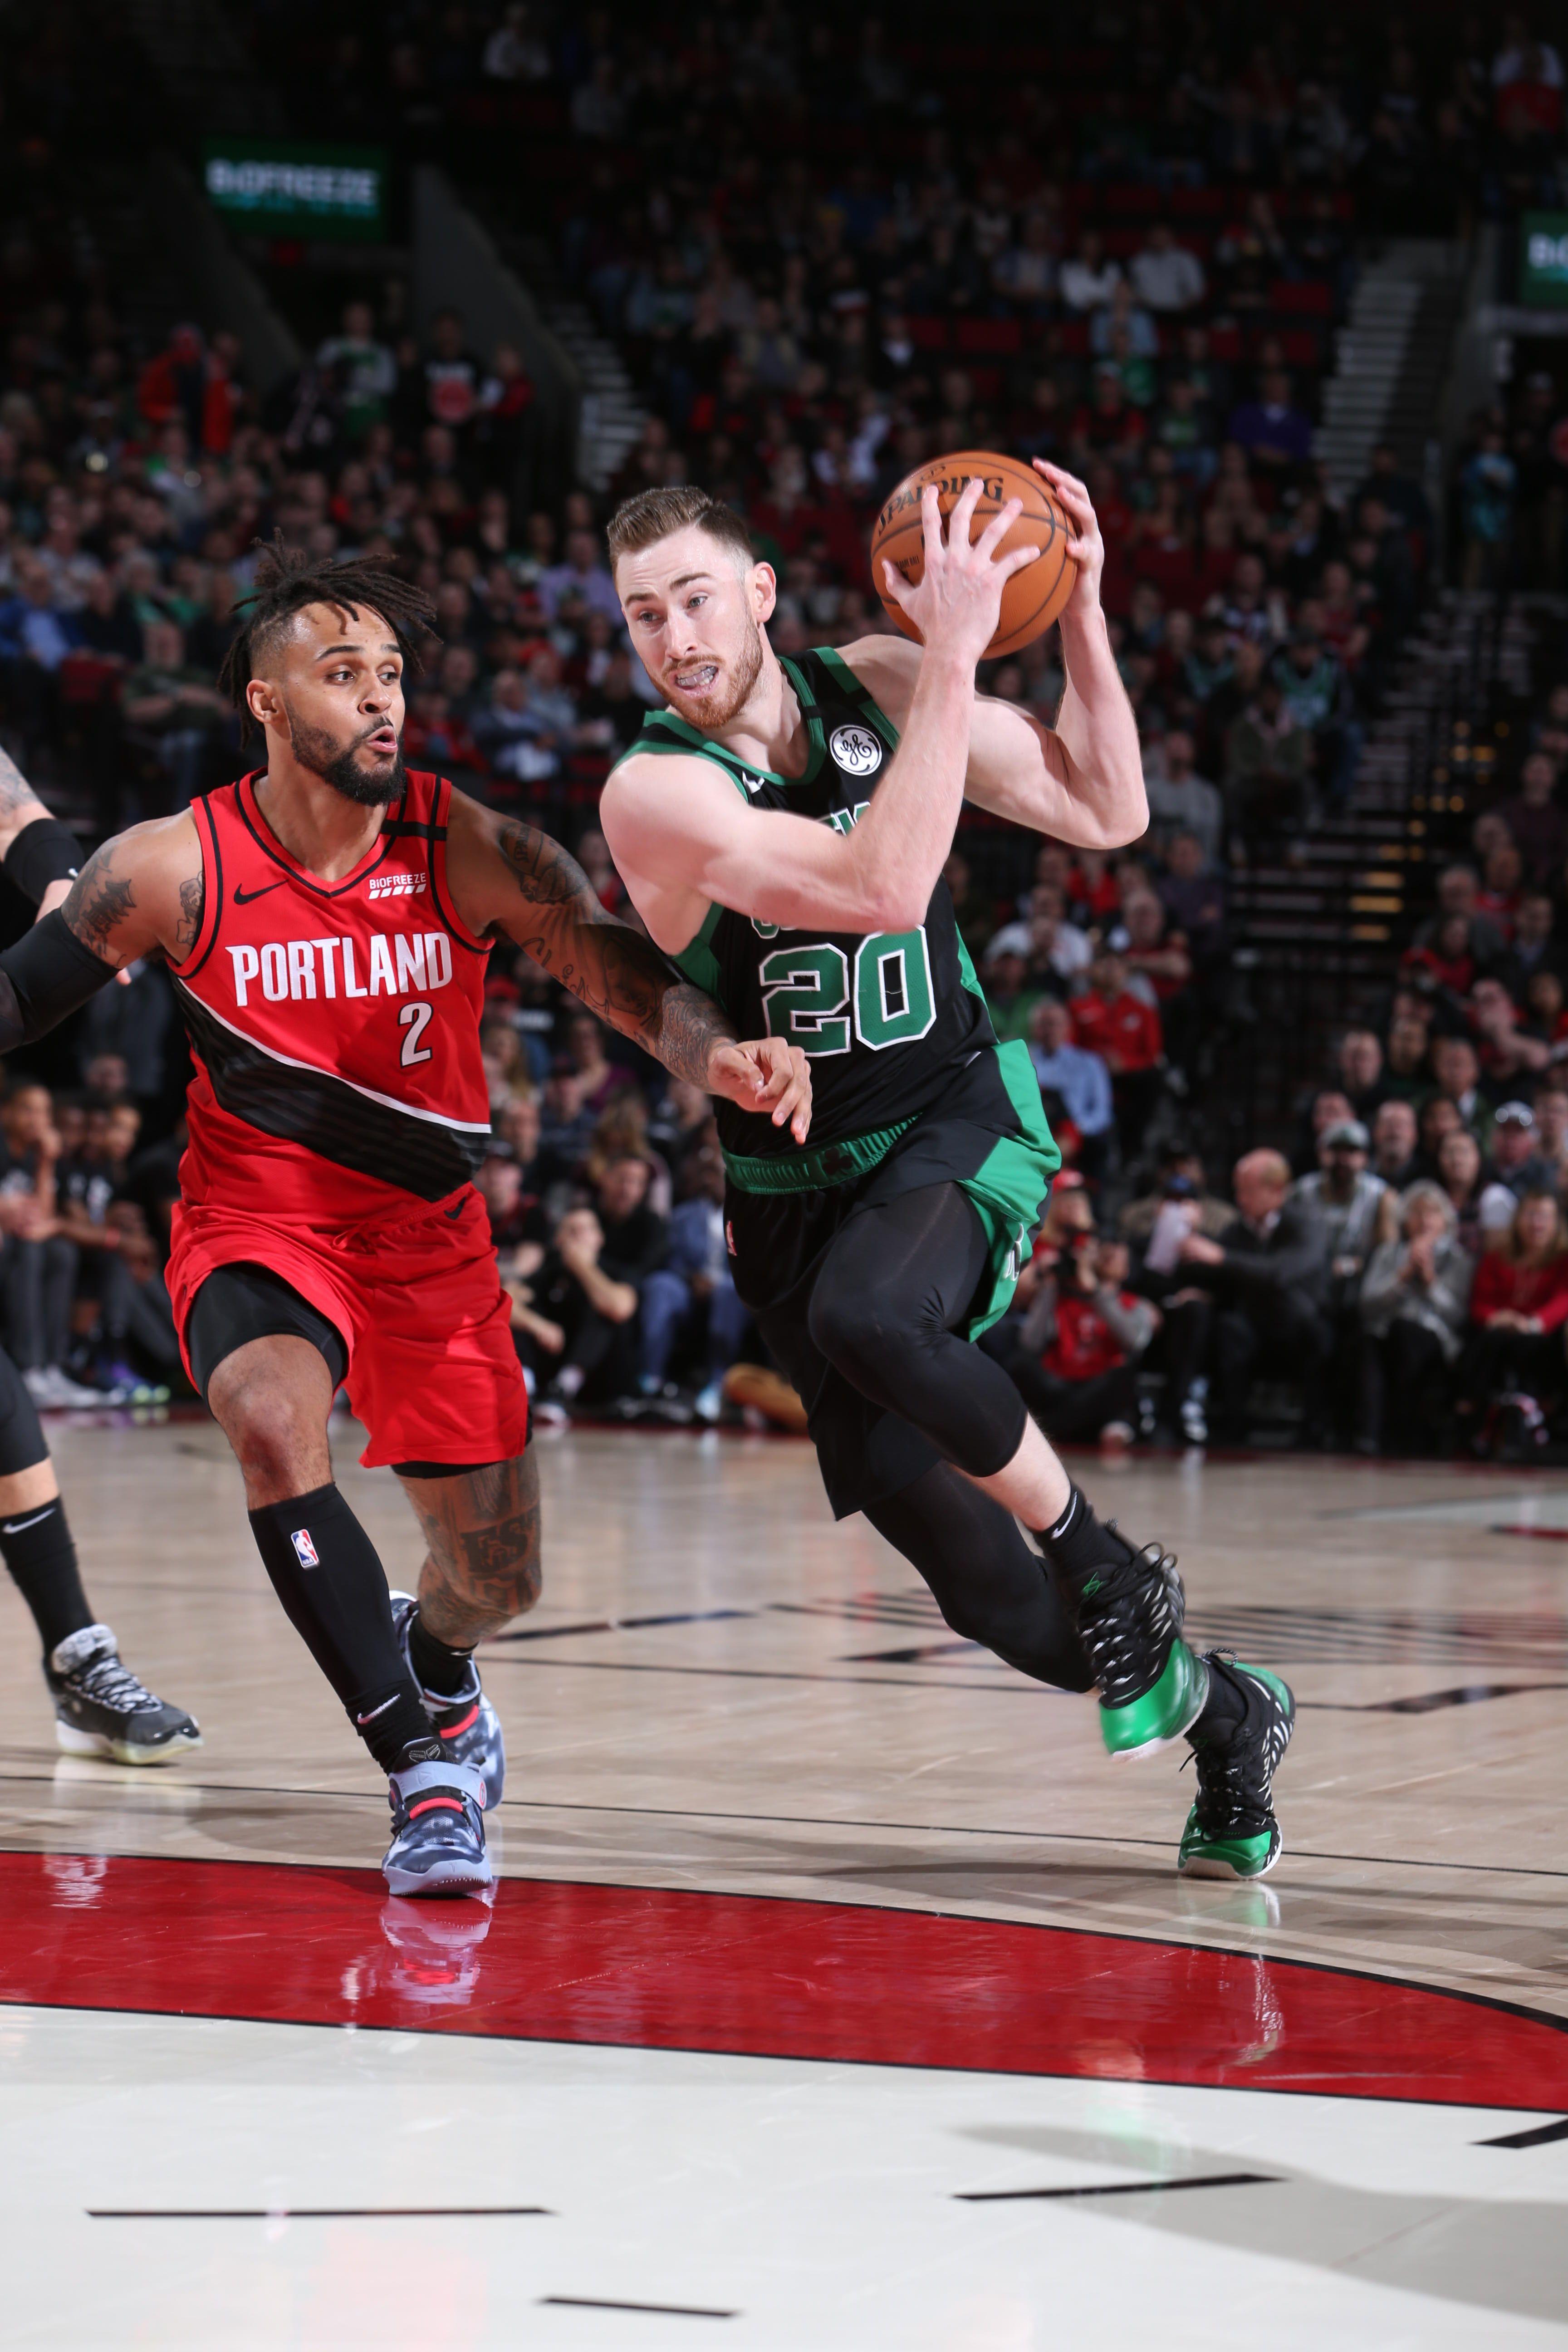 Photos Celtics Vs Trail Blazers Feb 25 2020 Boston Celtics Trail Blazers Boston Celtics Celtic